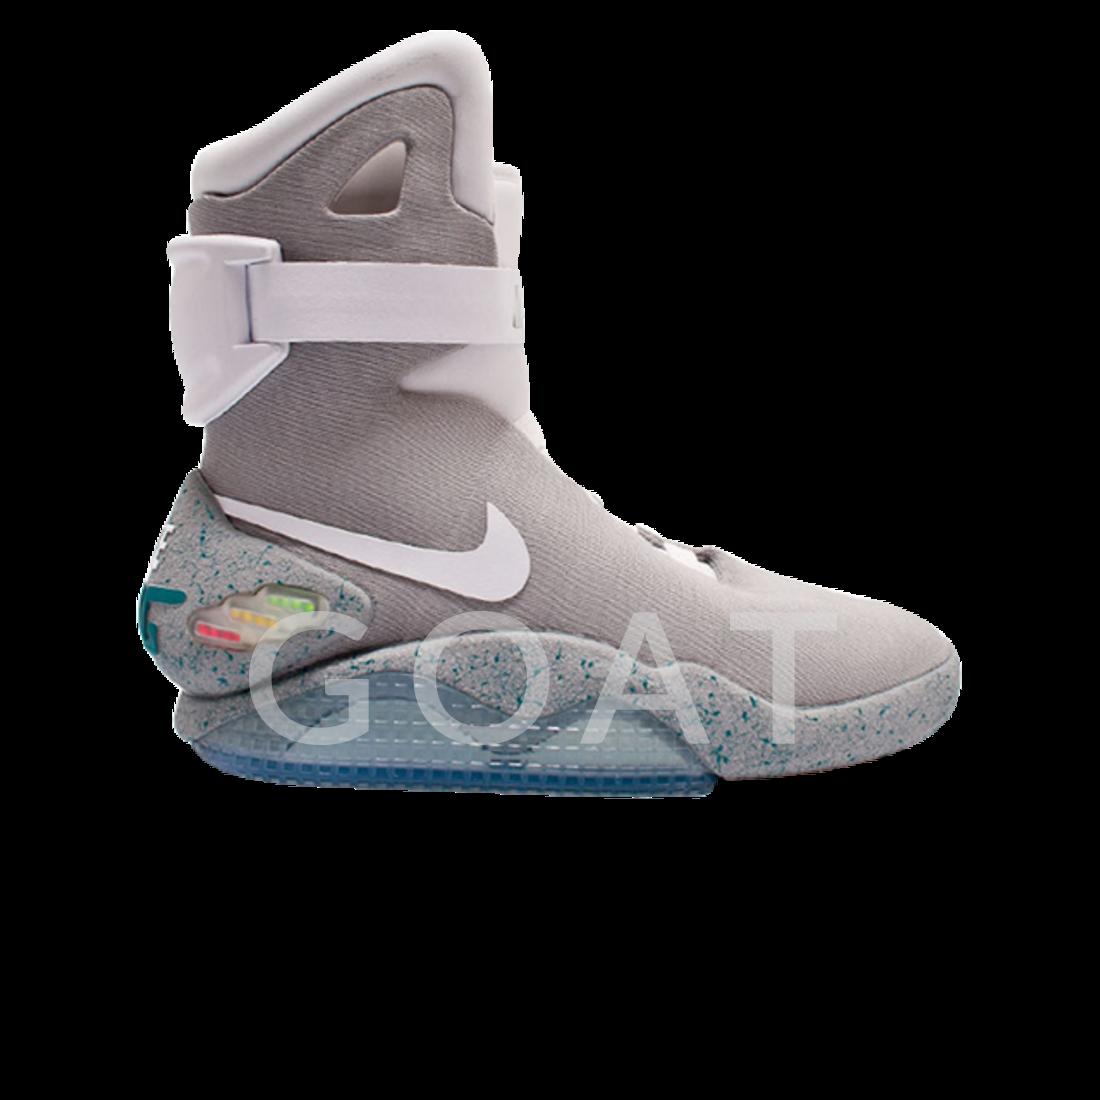 Nike Mag 'Back To The Future' - Nike